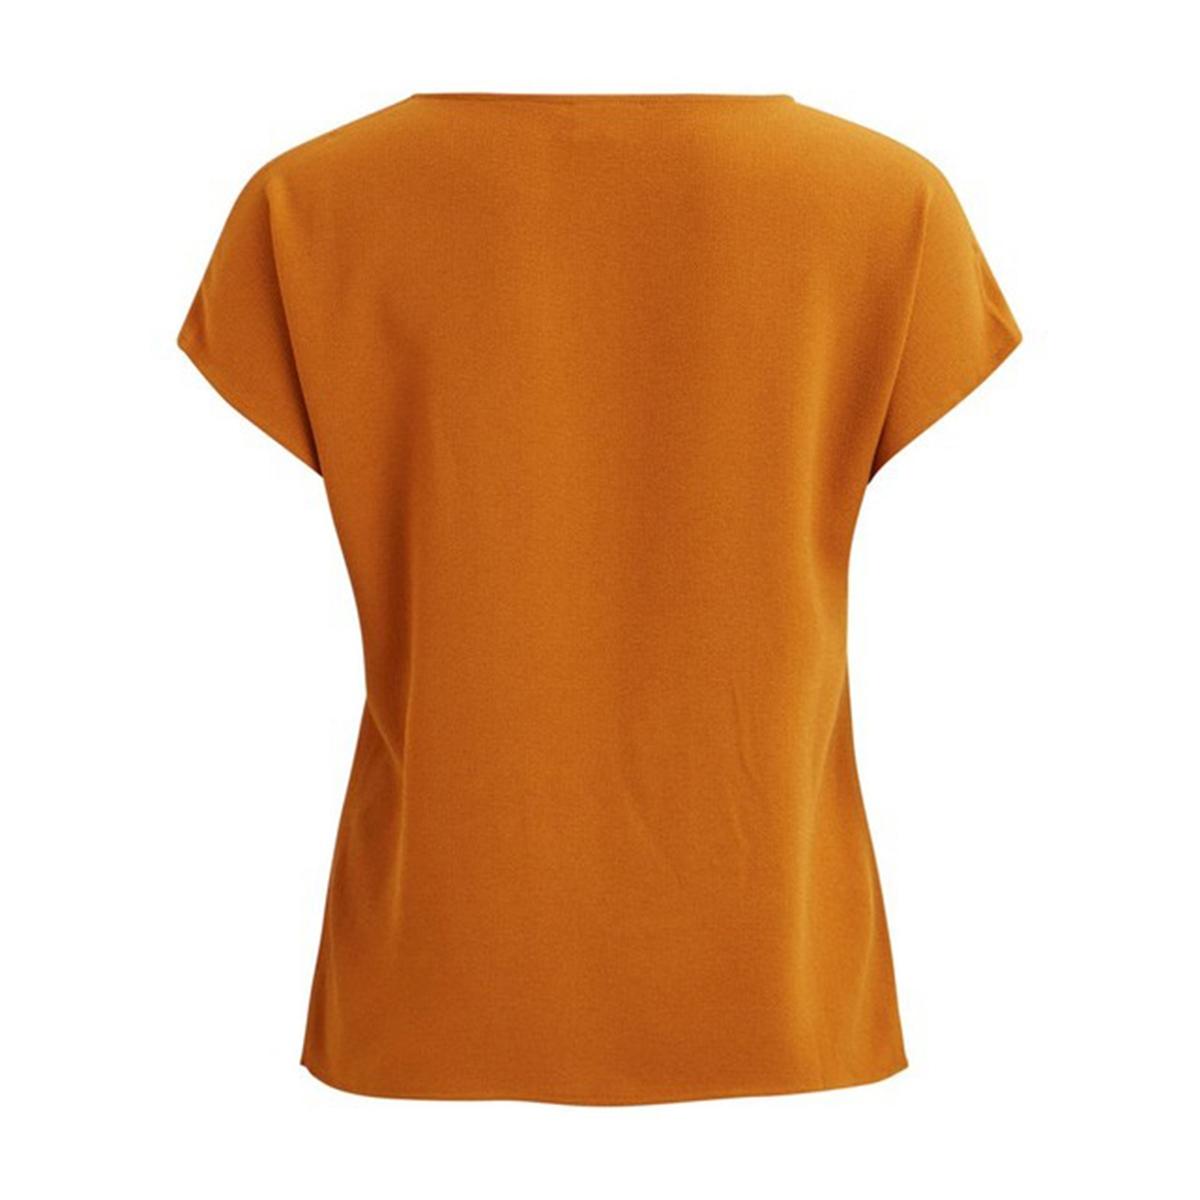 цена Блузка La Redoute С короткими рукавами и завязками спереди 34 (FR) - 40 (RUS) каштановый онлайн в 2017 году